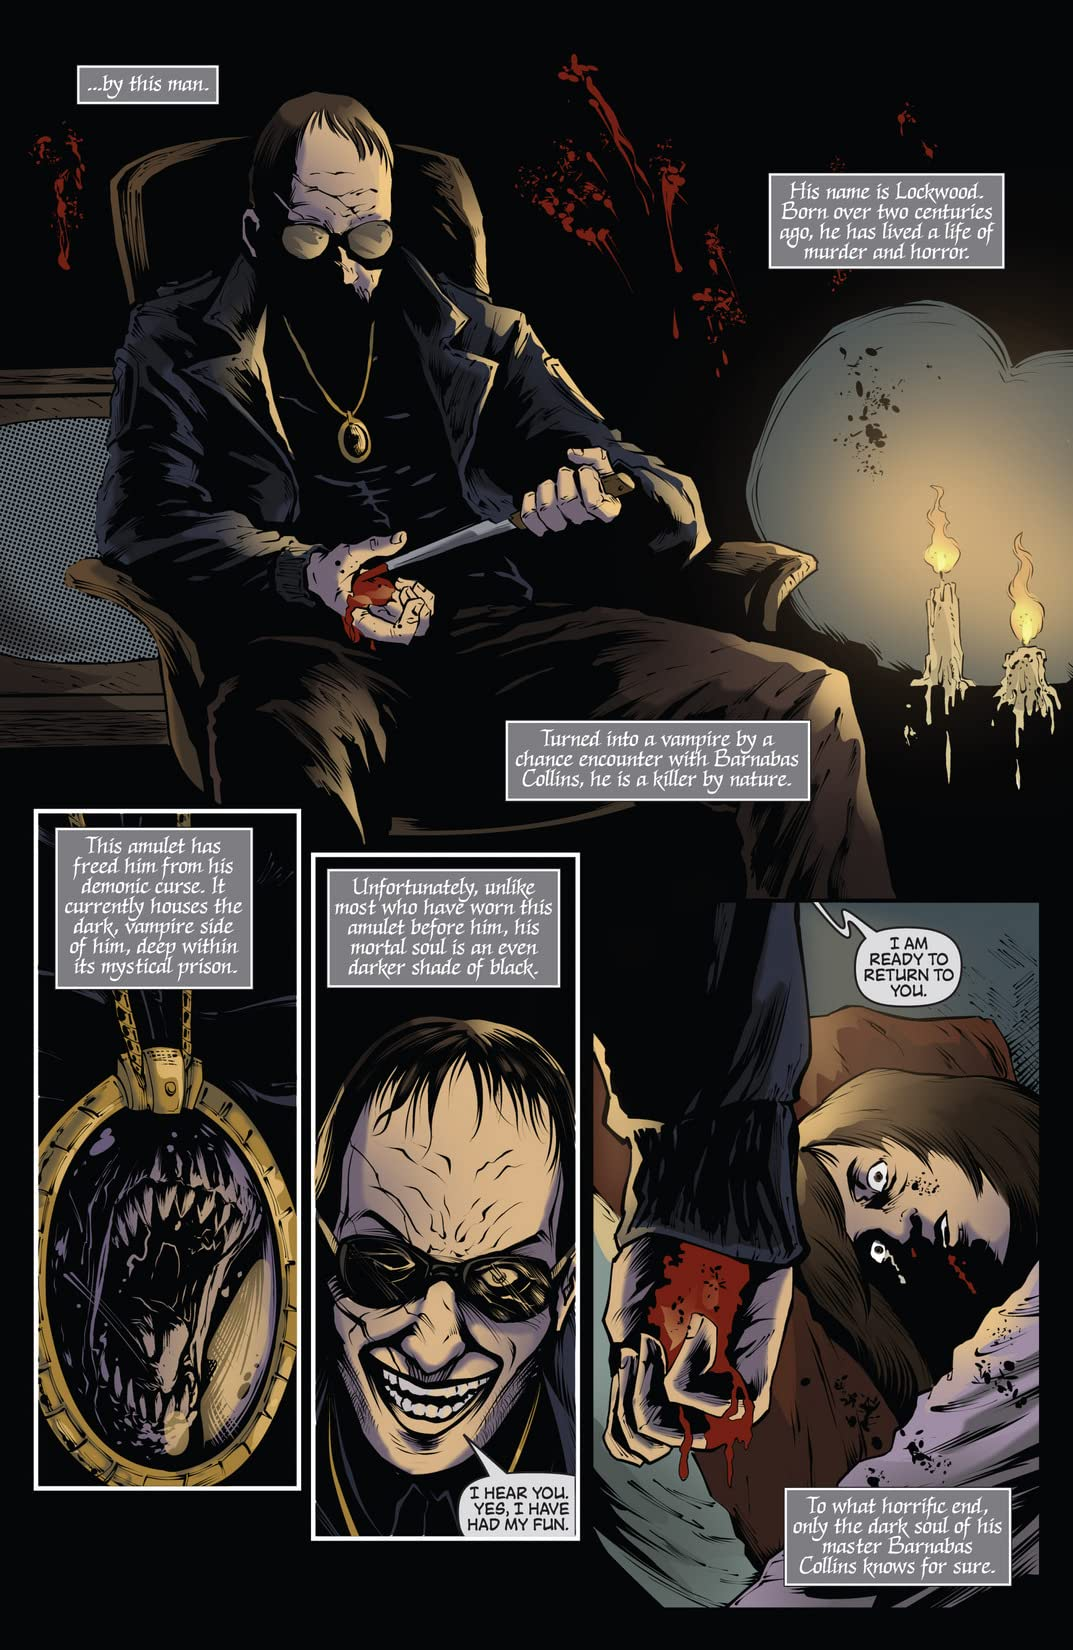 Dark Shadows (Ongoing) #20